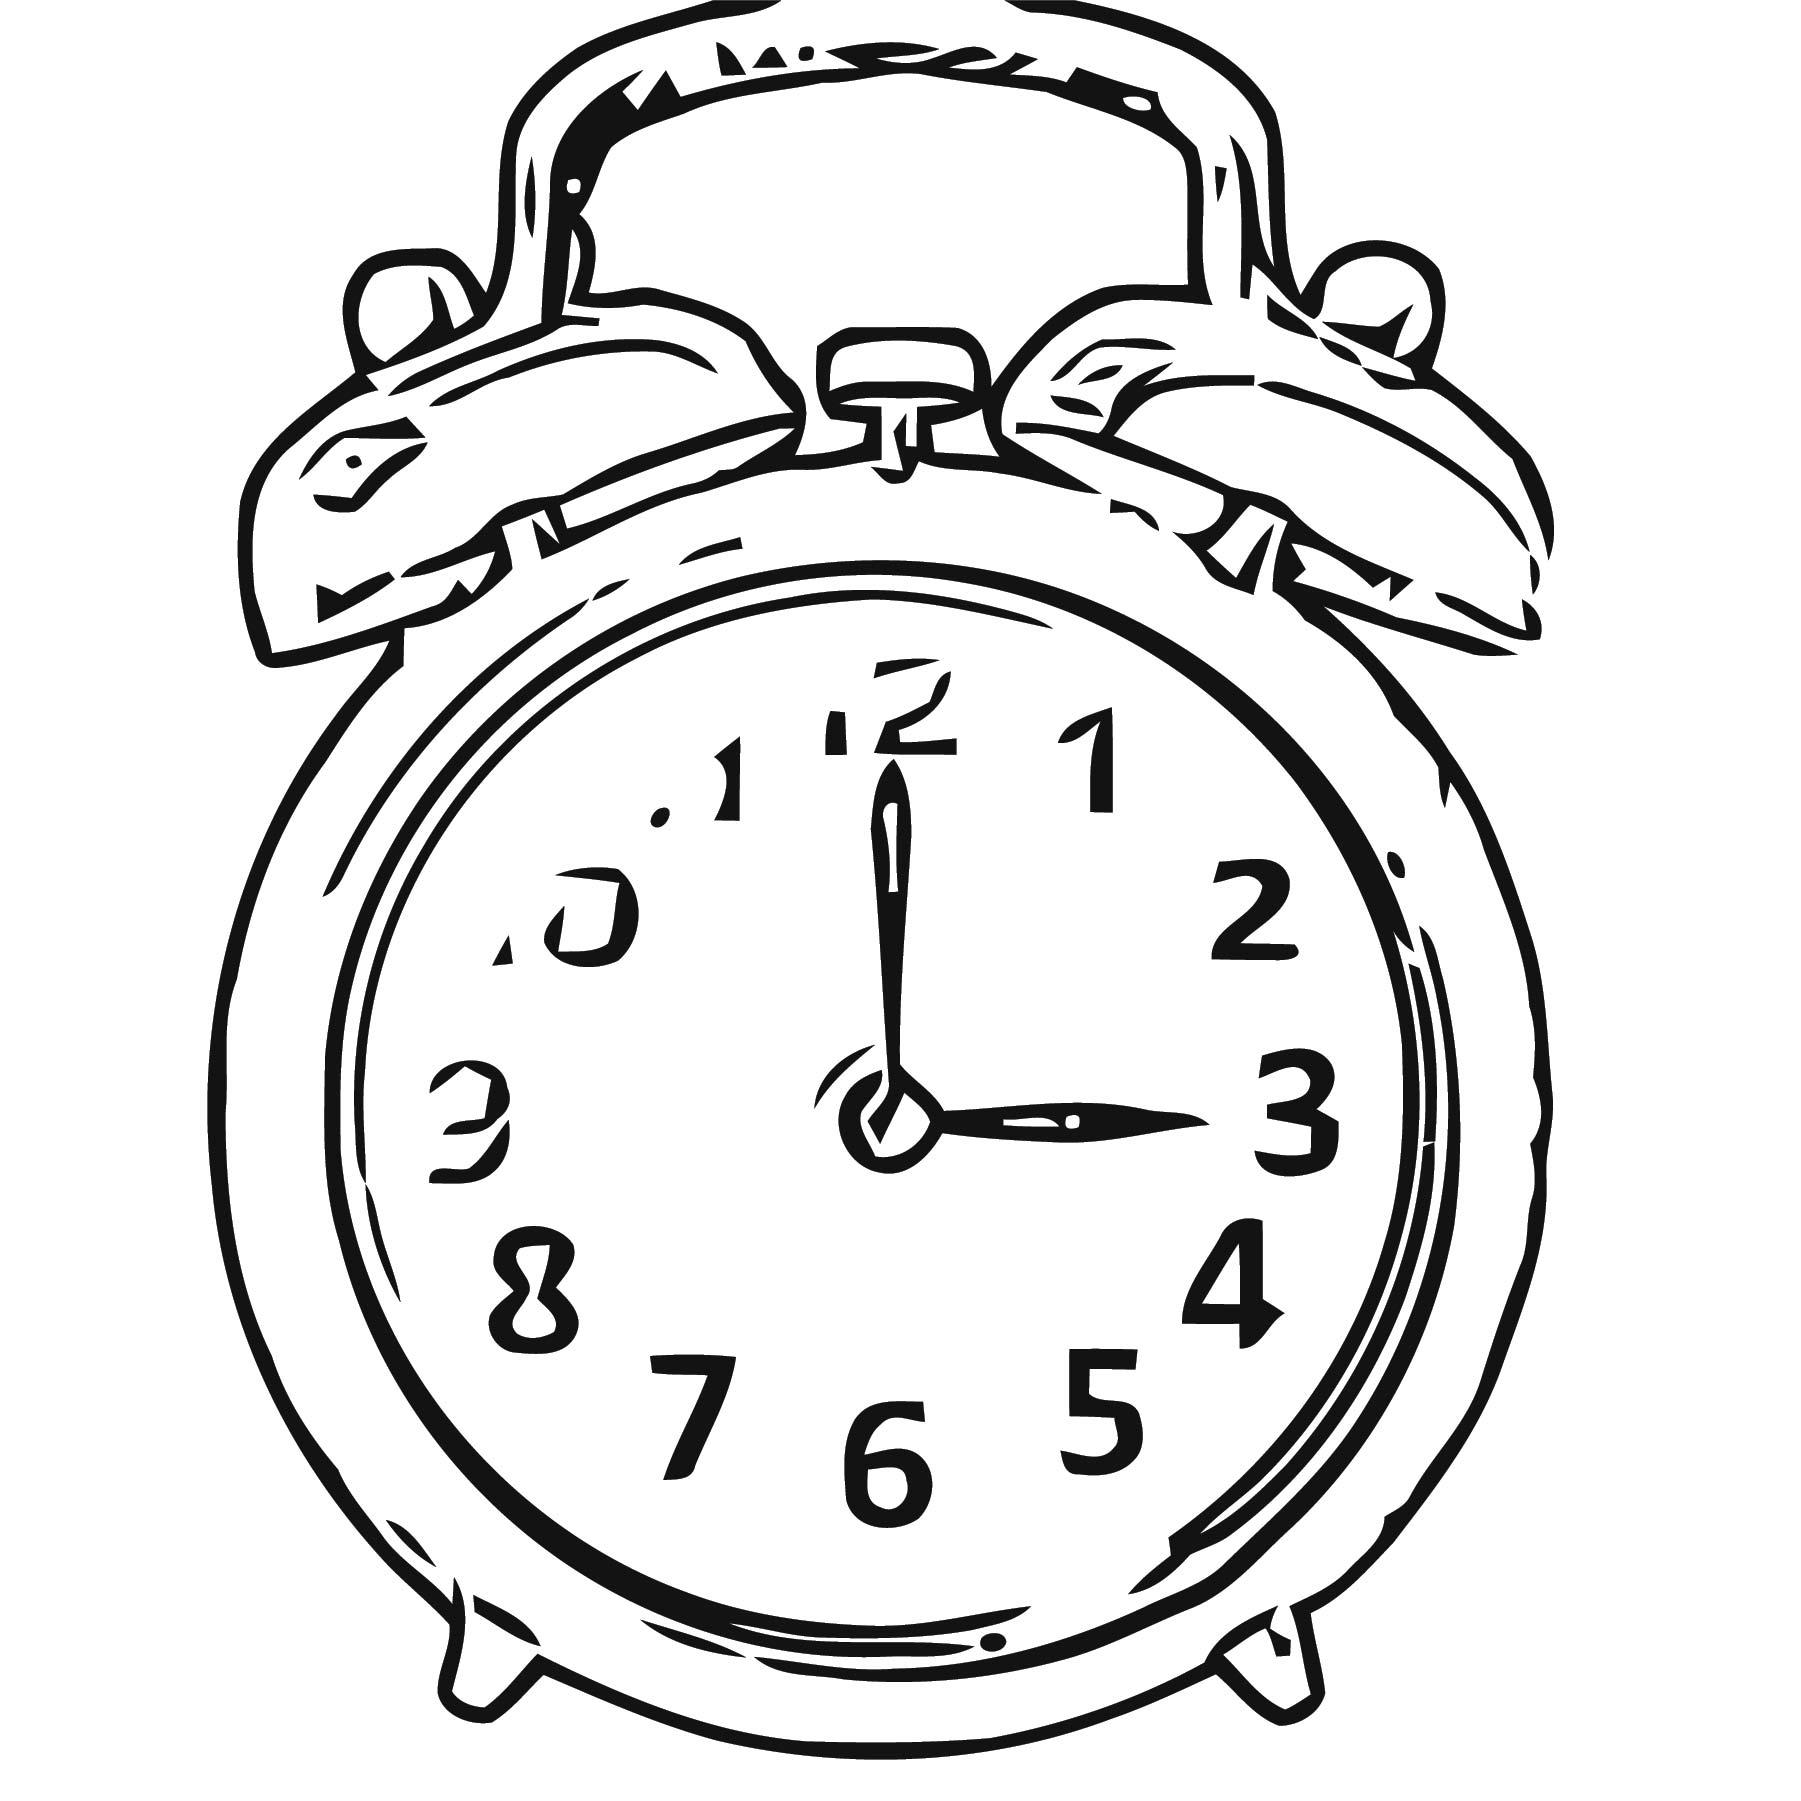 Online Alarm Clo Free Printable Ck Cartoonized Free Printable Coloring Page